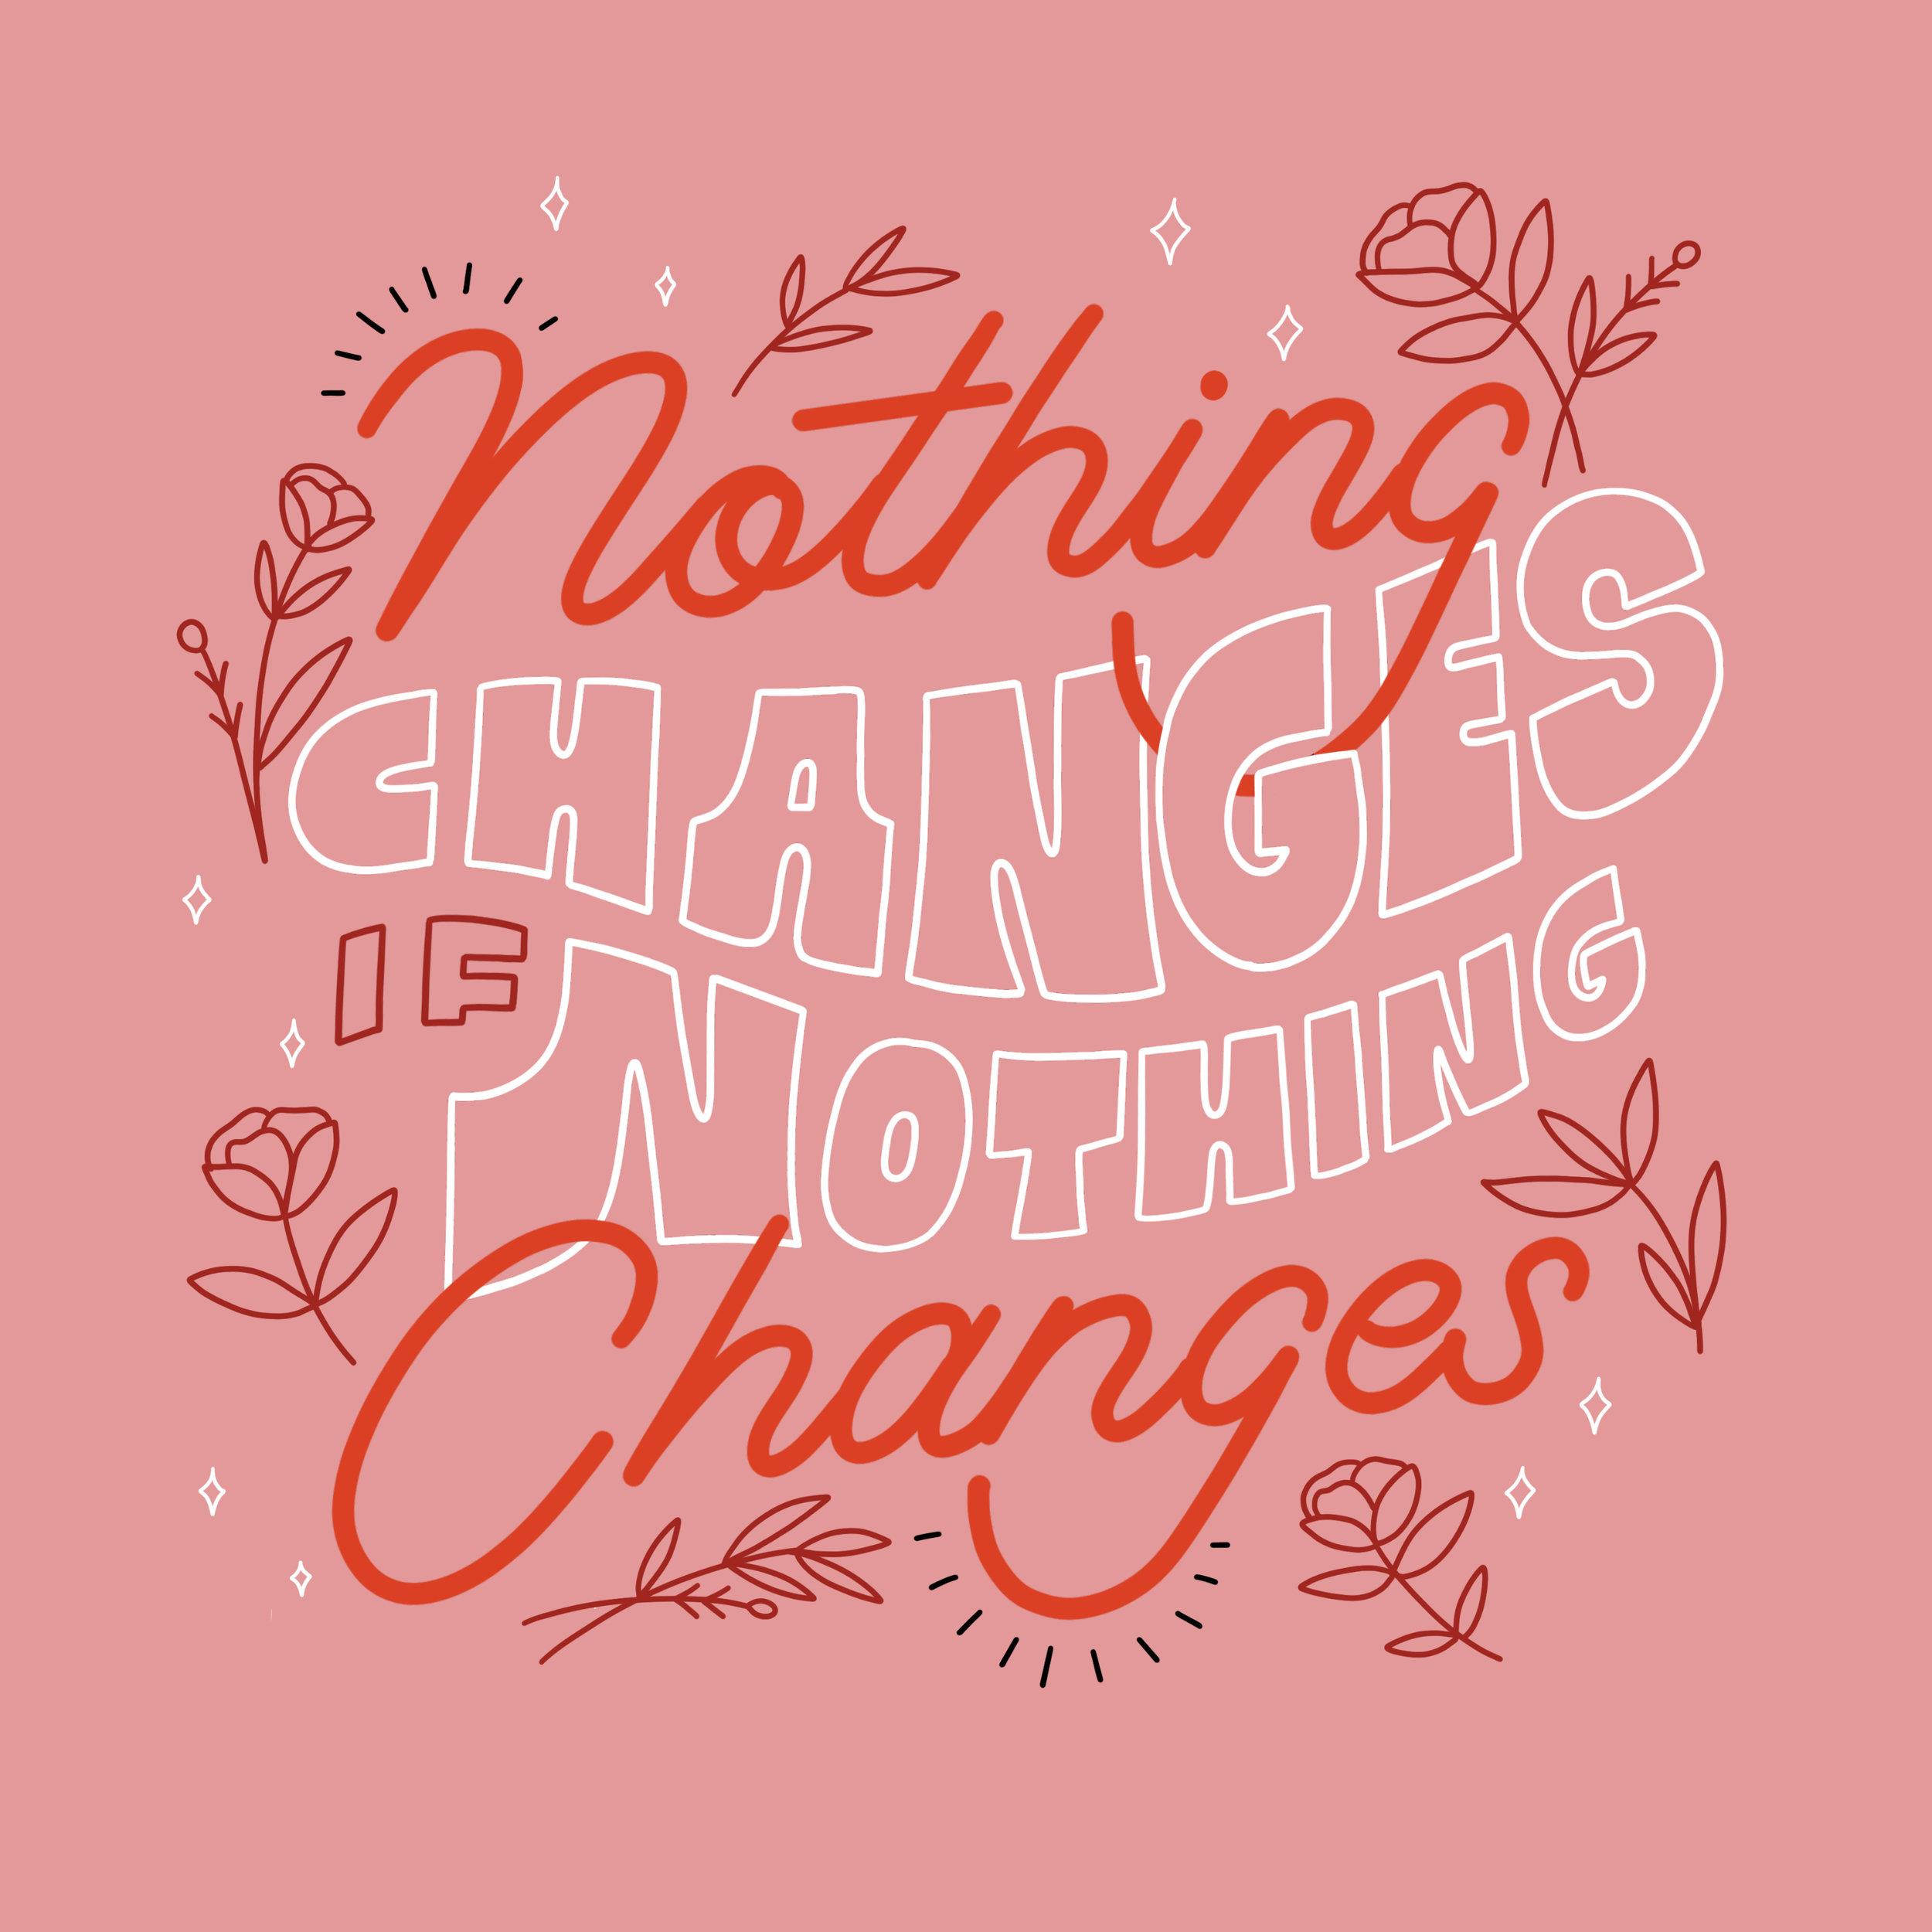 nothingchanges.jpg